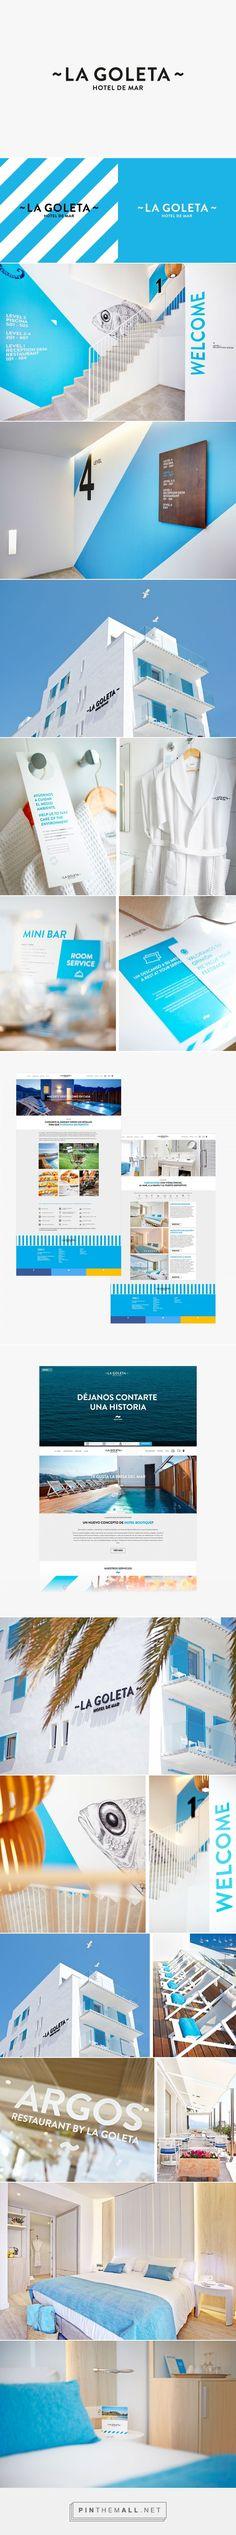 La Goleta Hotel de Mar on Behance - created via https://pinthemall.net